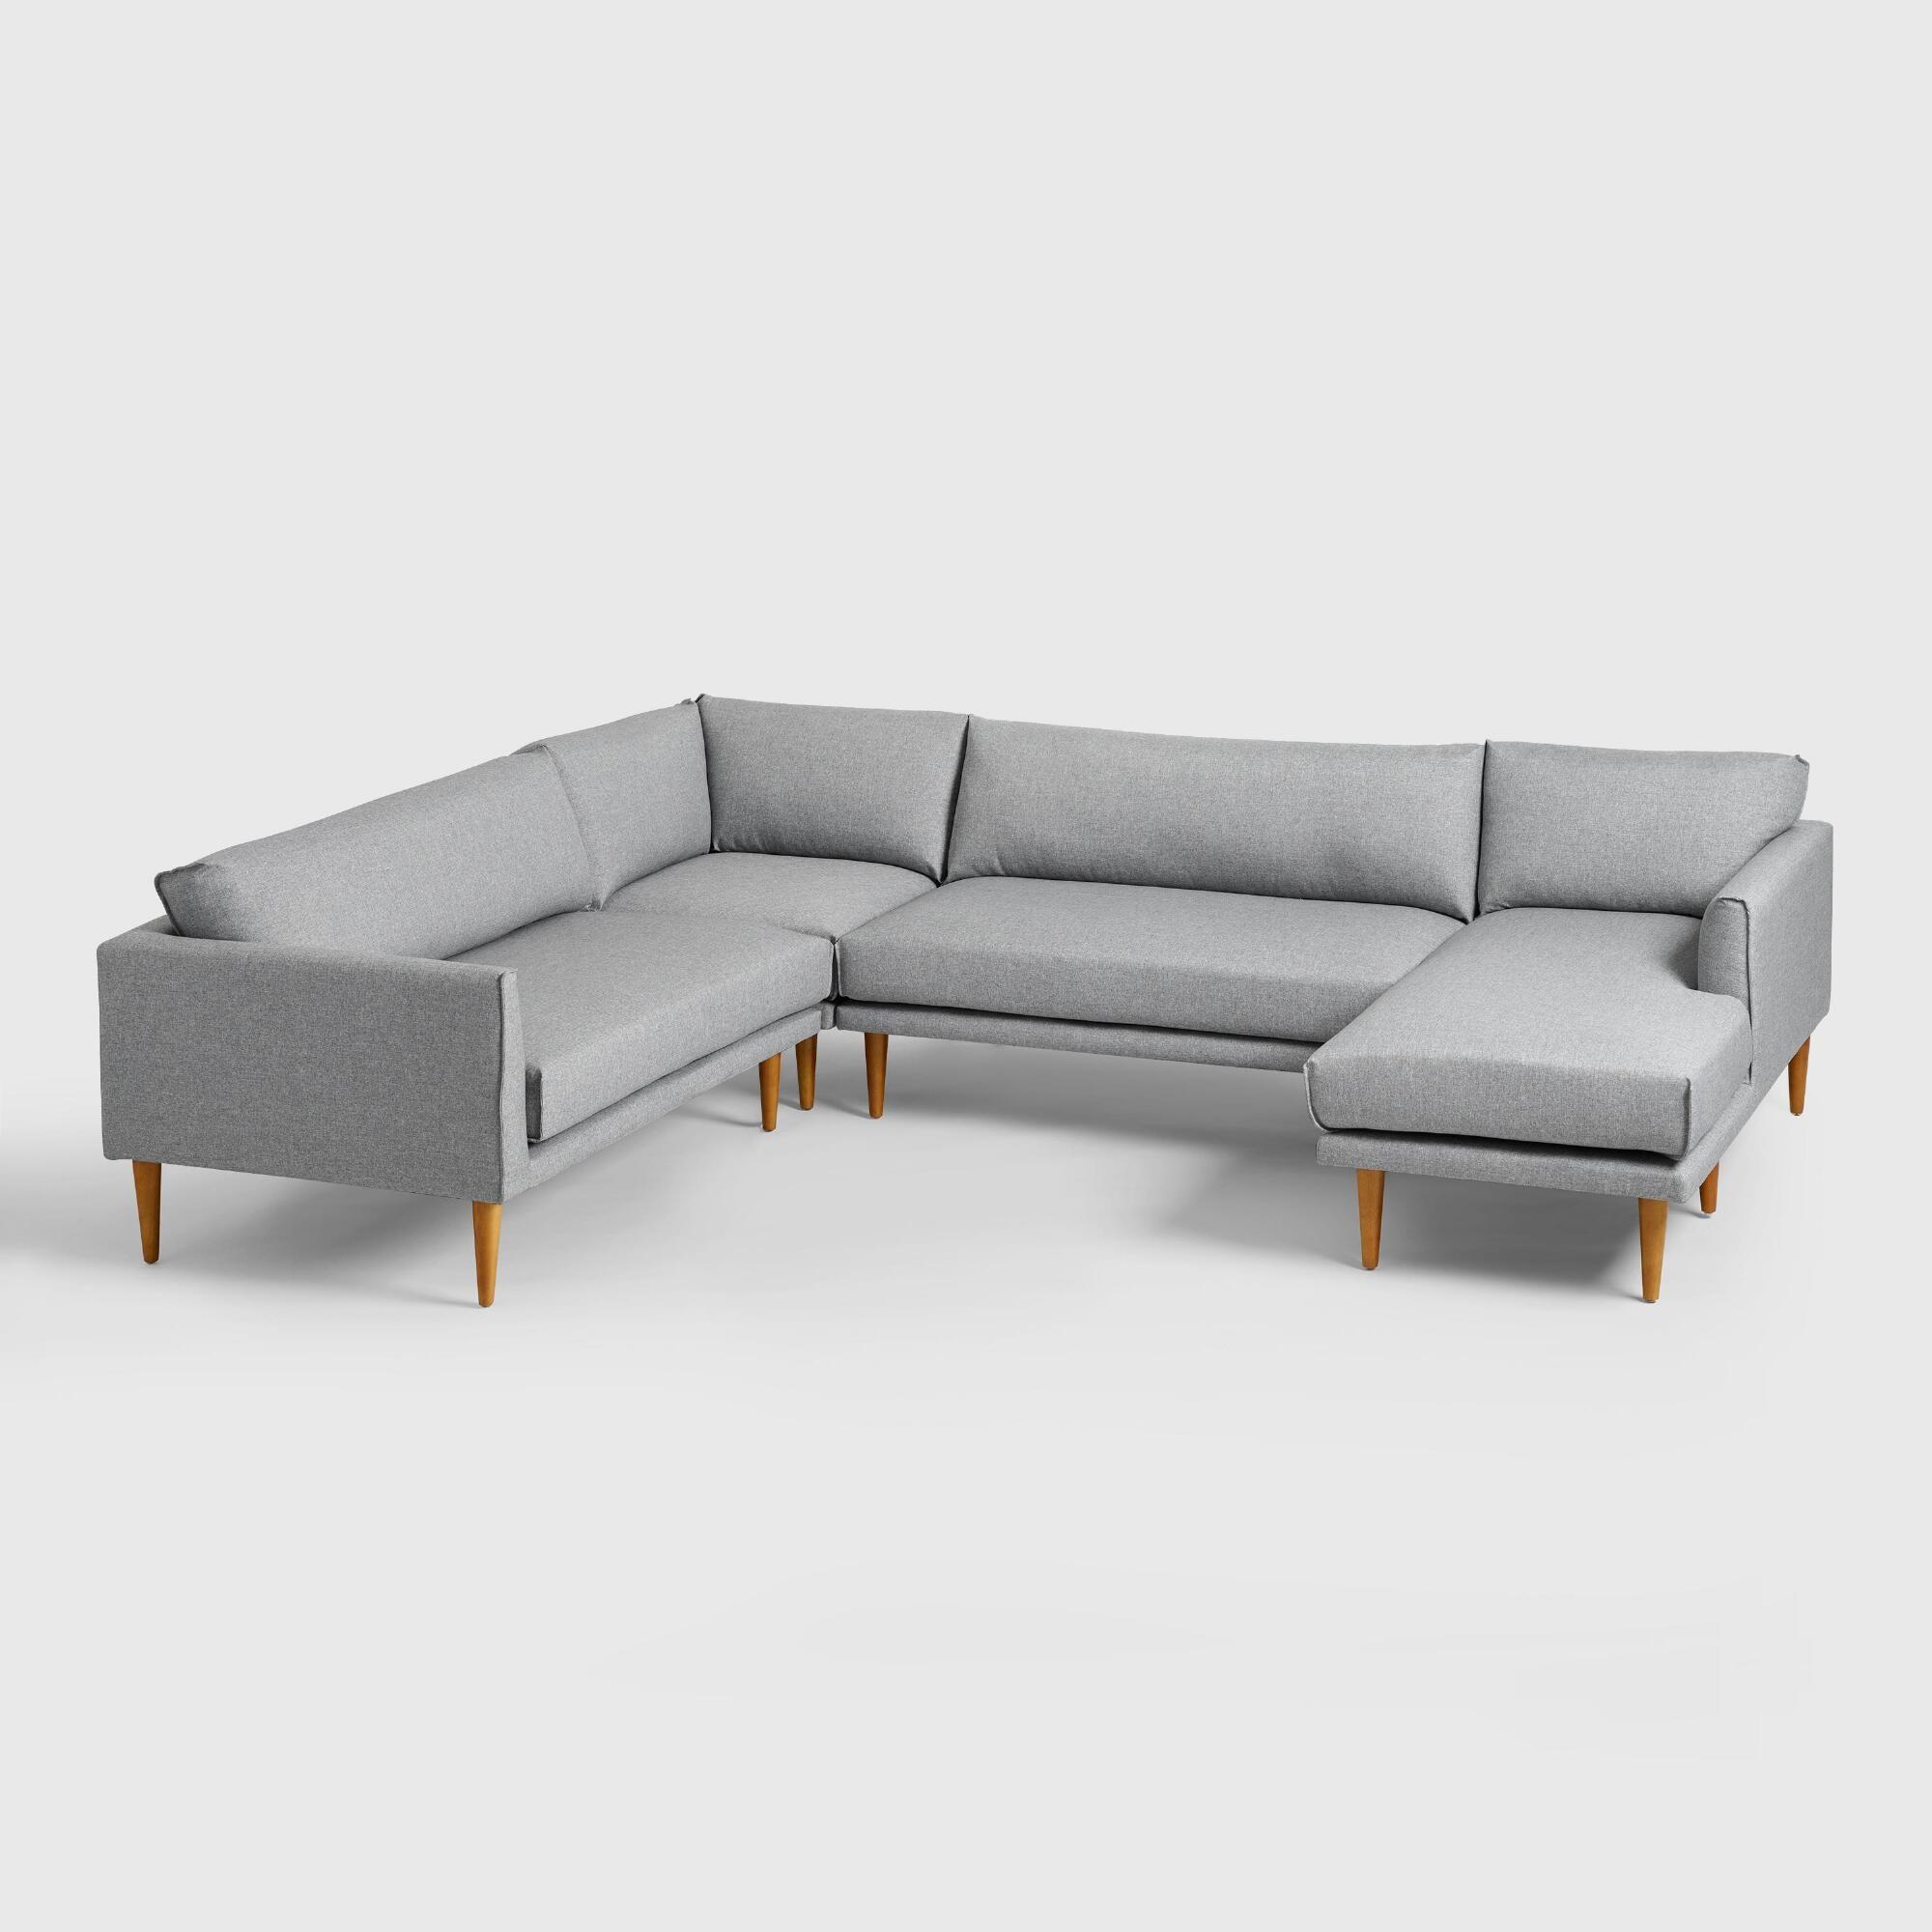 Gray Nica Sectional Sofa Collection